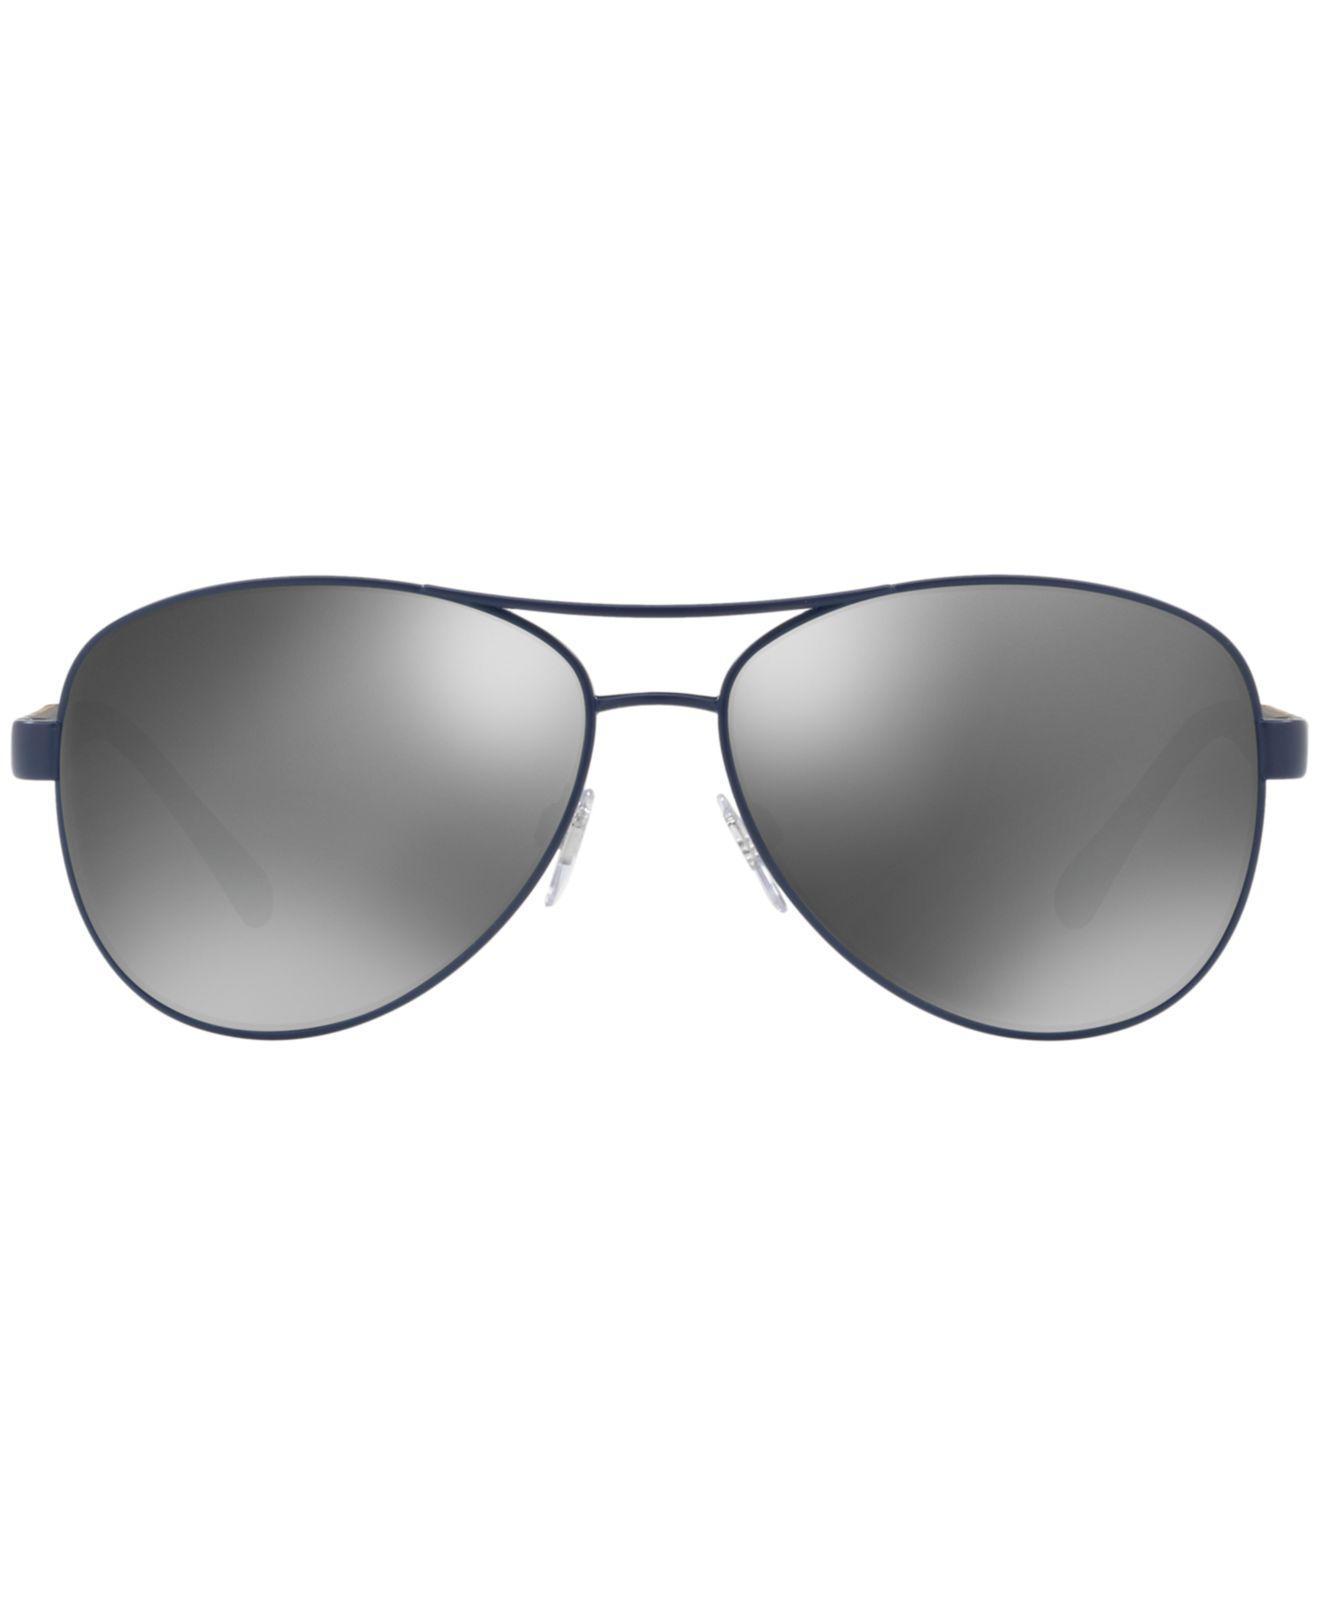 9fc3c34c55d Lyst - Burberry Sunglasses